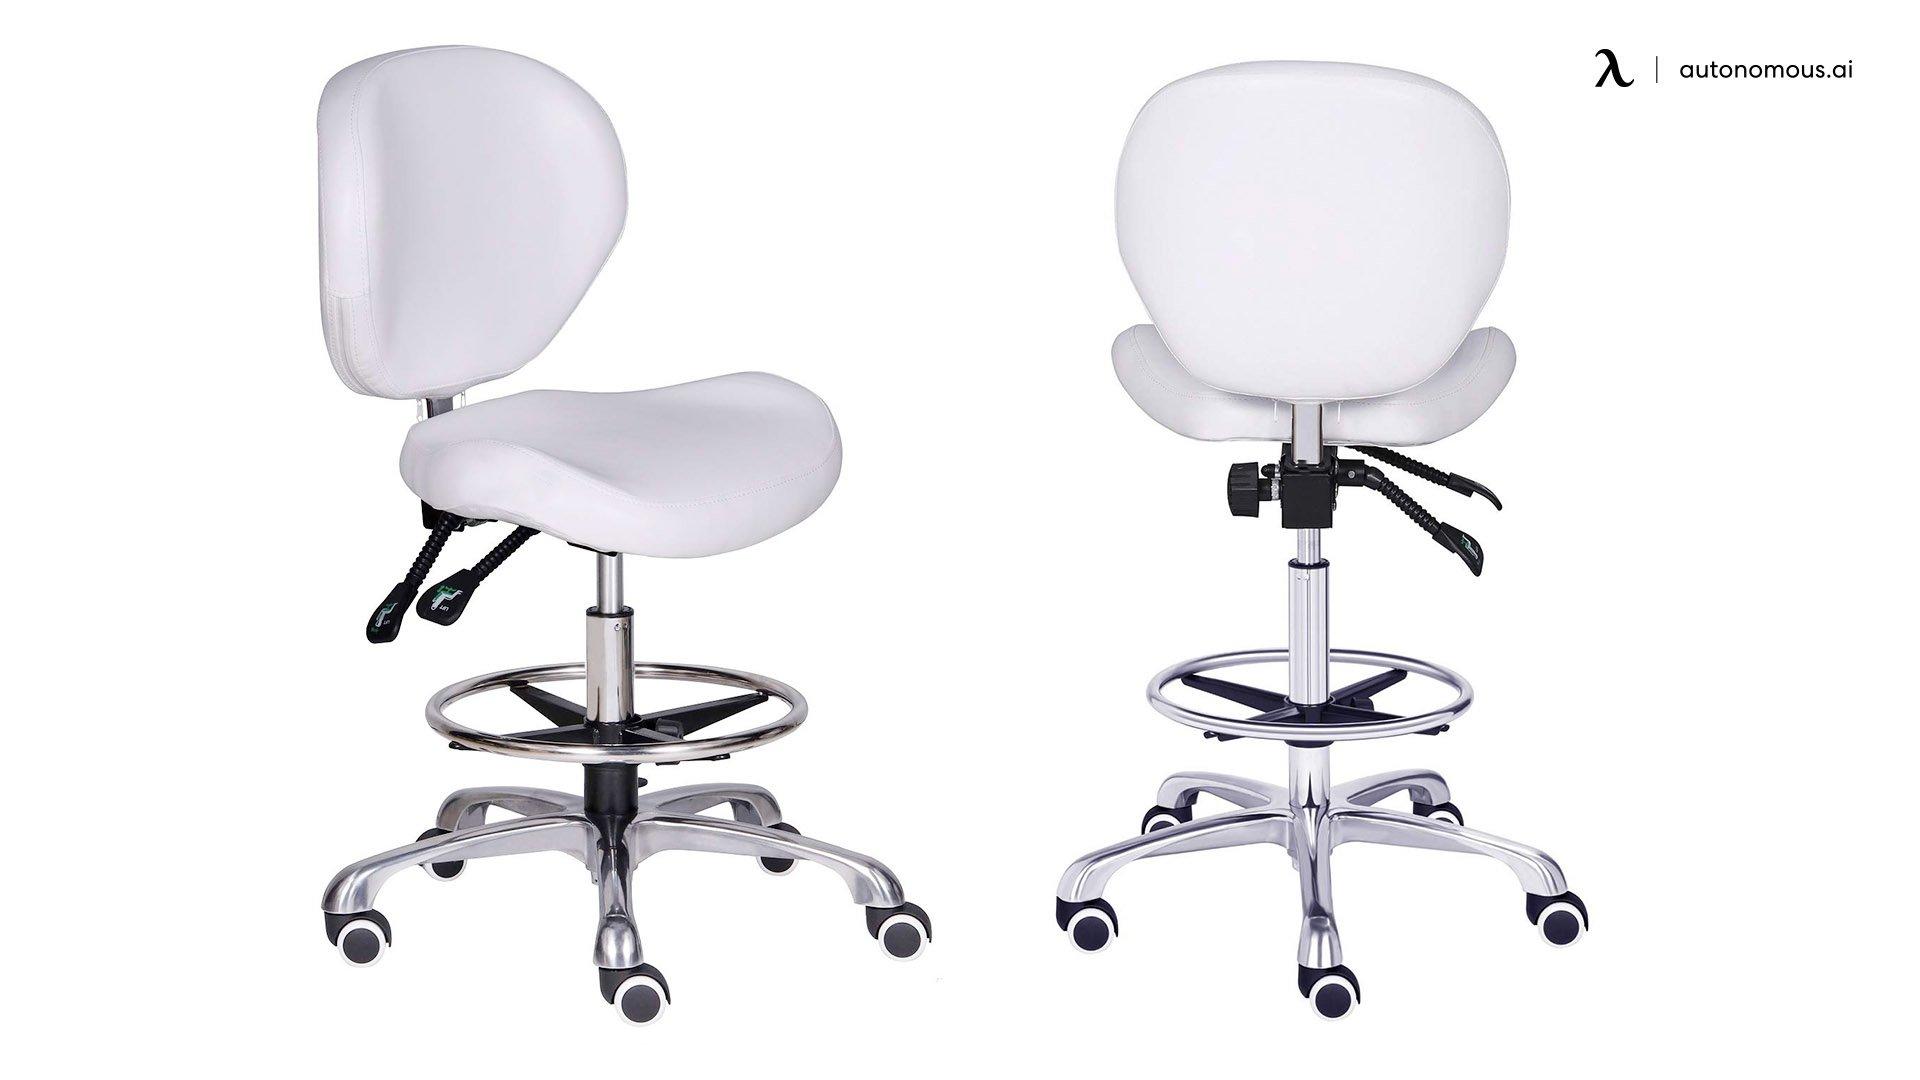 Drafting Chair by Kaleurrier Adjustable Stools